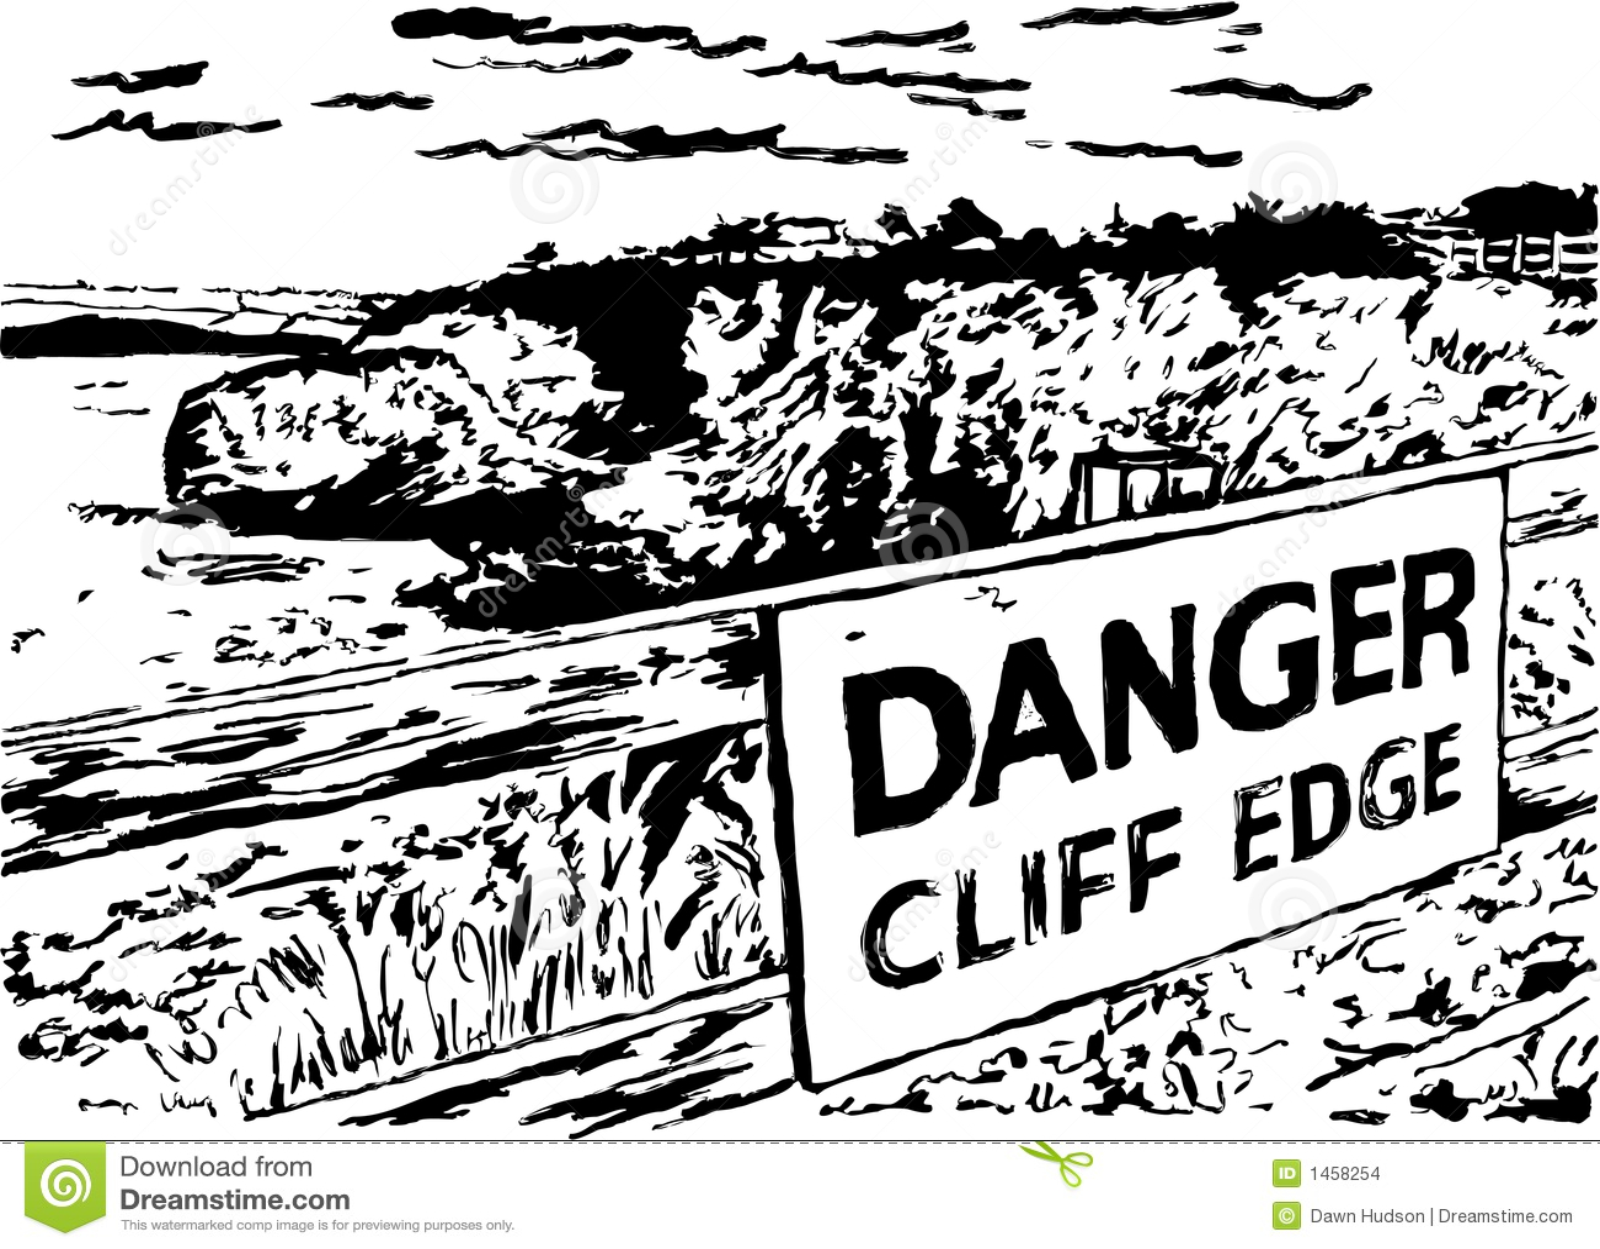 Danger Cliff Edge Stock Images Image 1458254